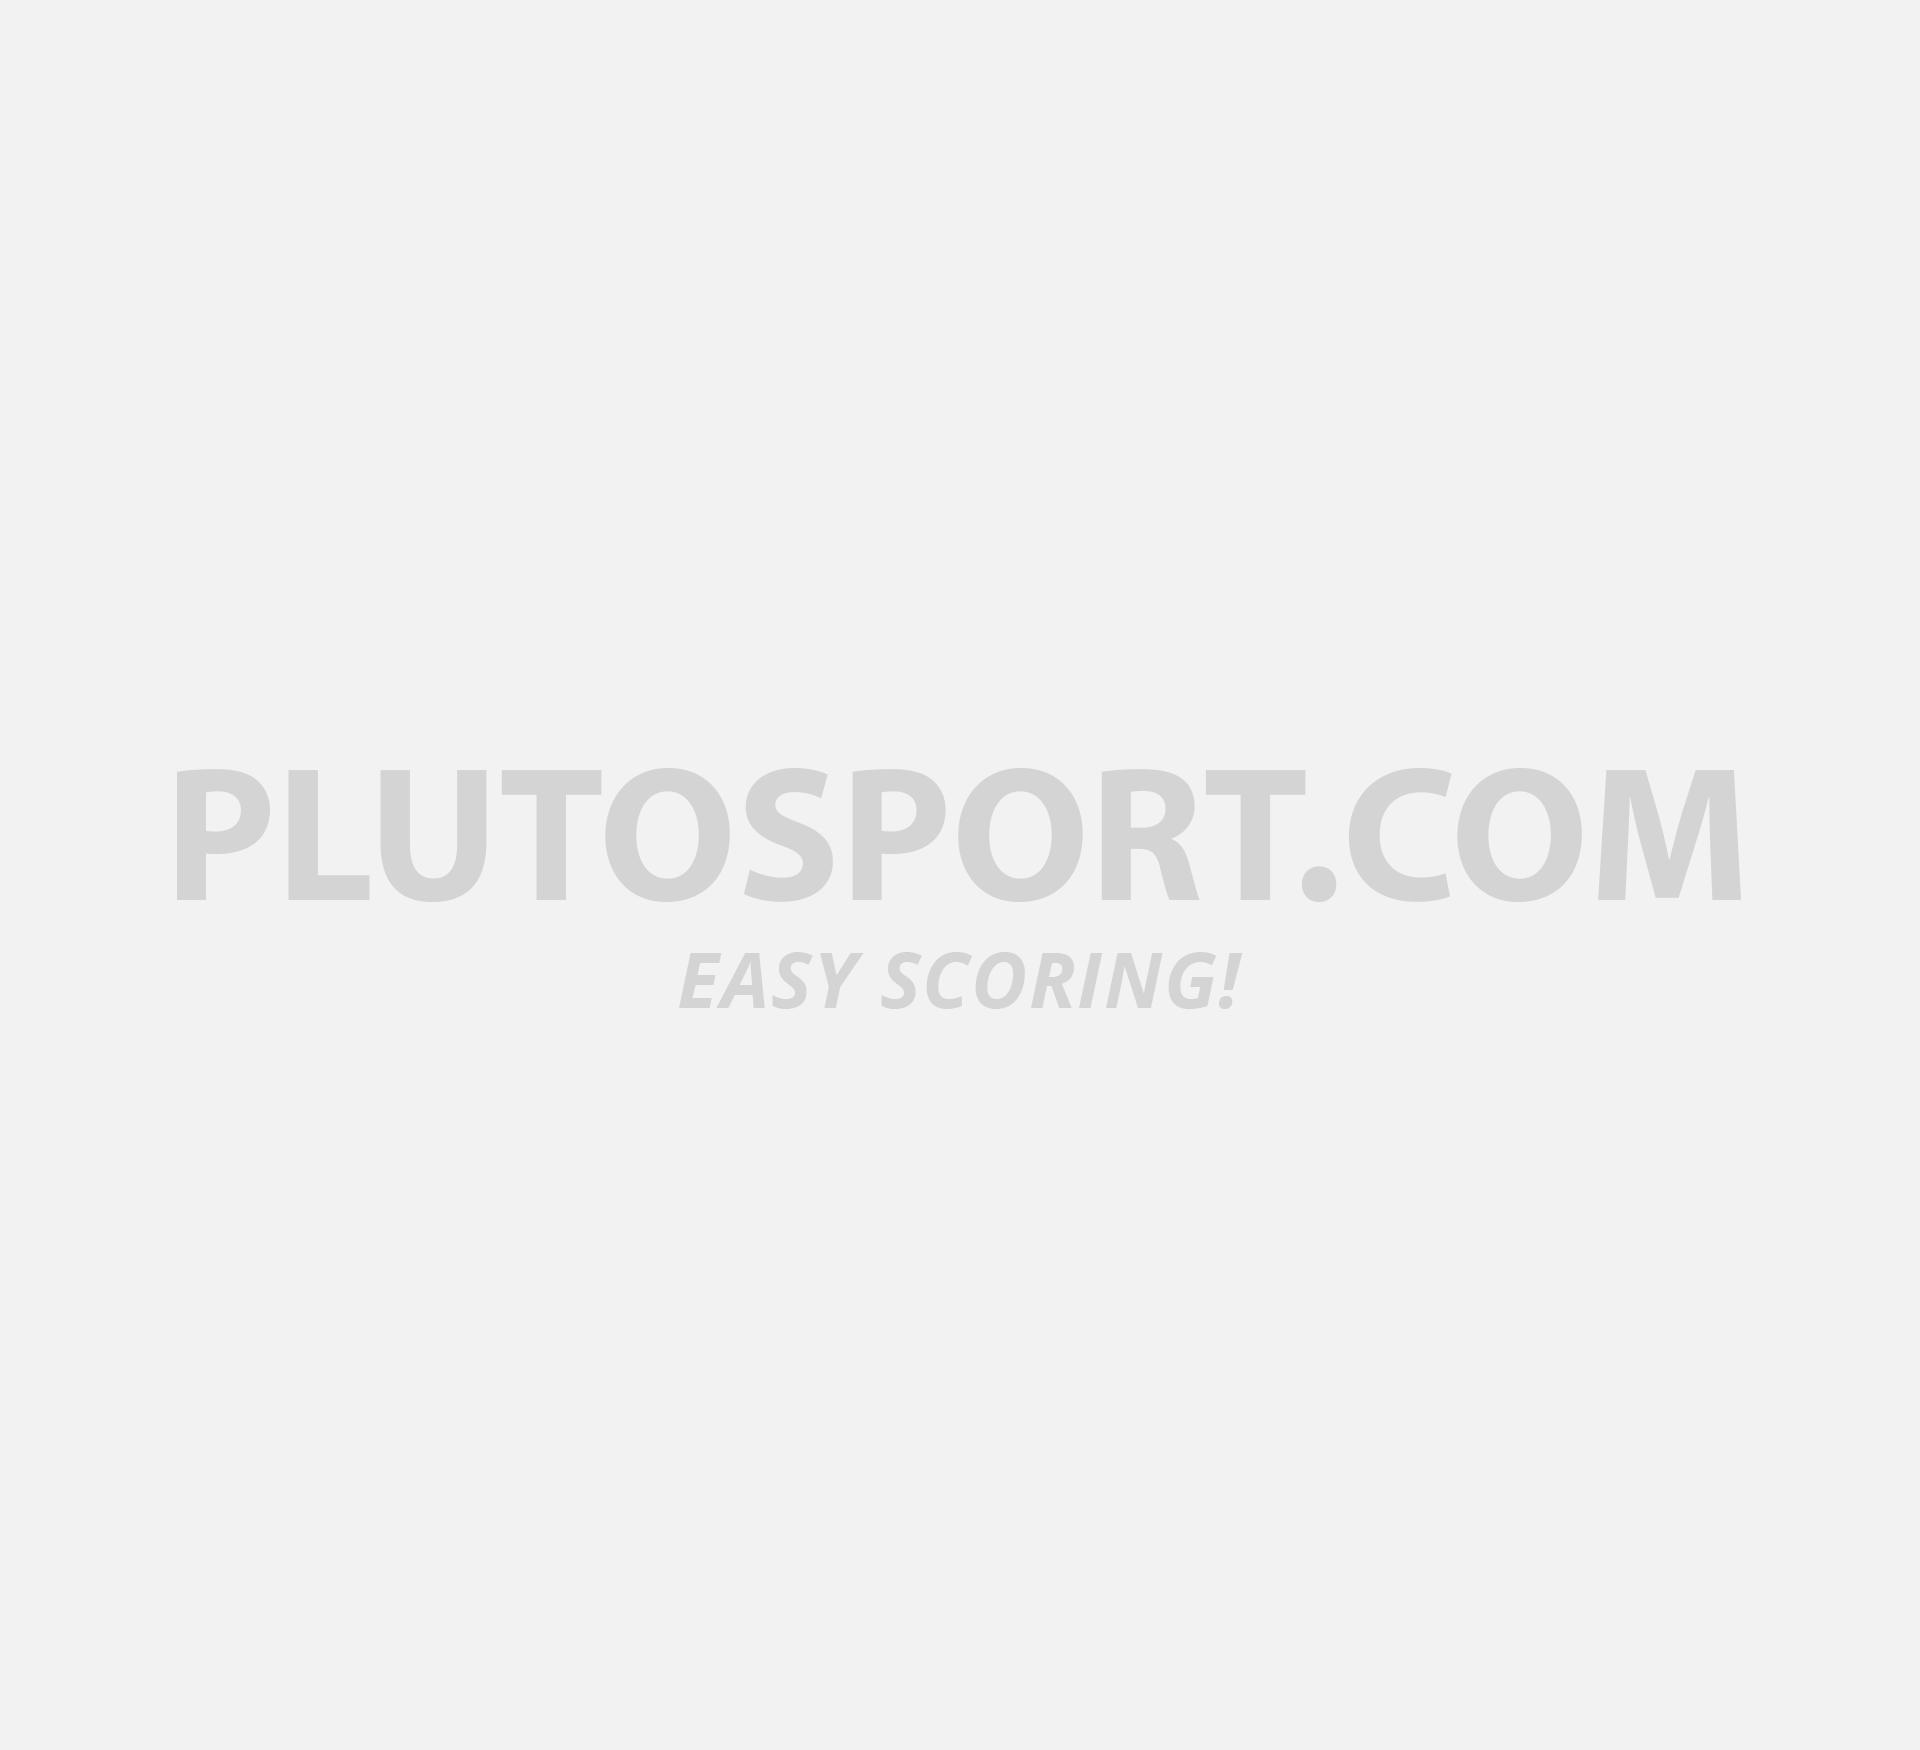 4e0b4f93d6f Adidas Response Short Running Tight Women's - Short tights - Tights -  Clothing - Running - Sports | Plutosport